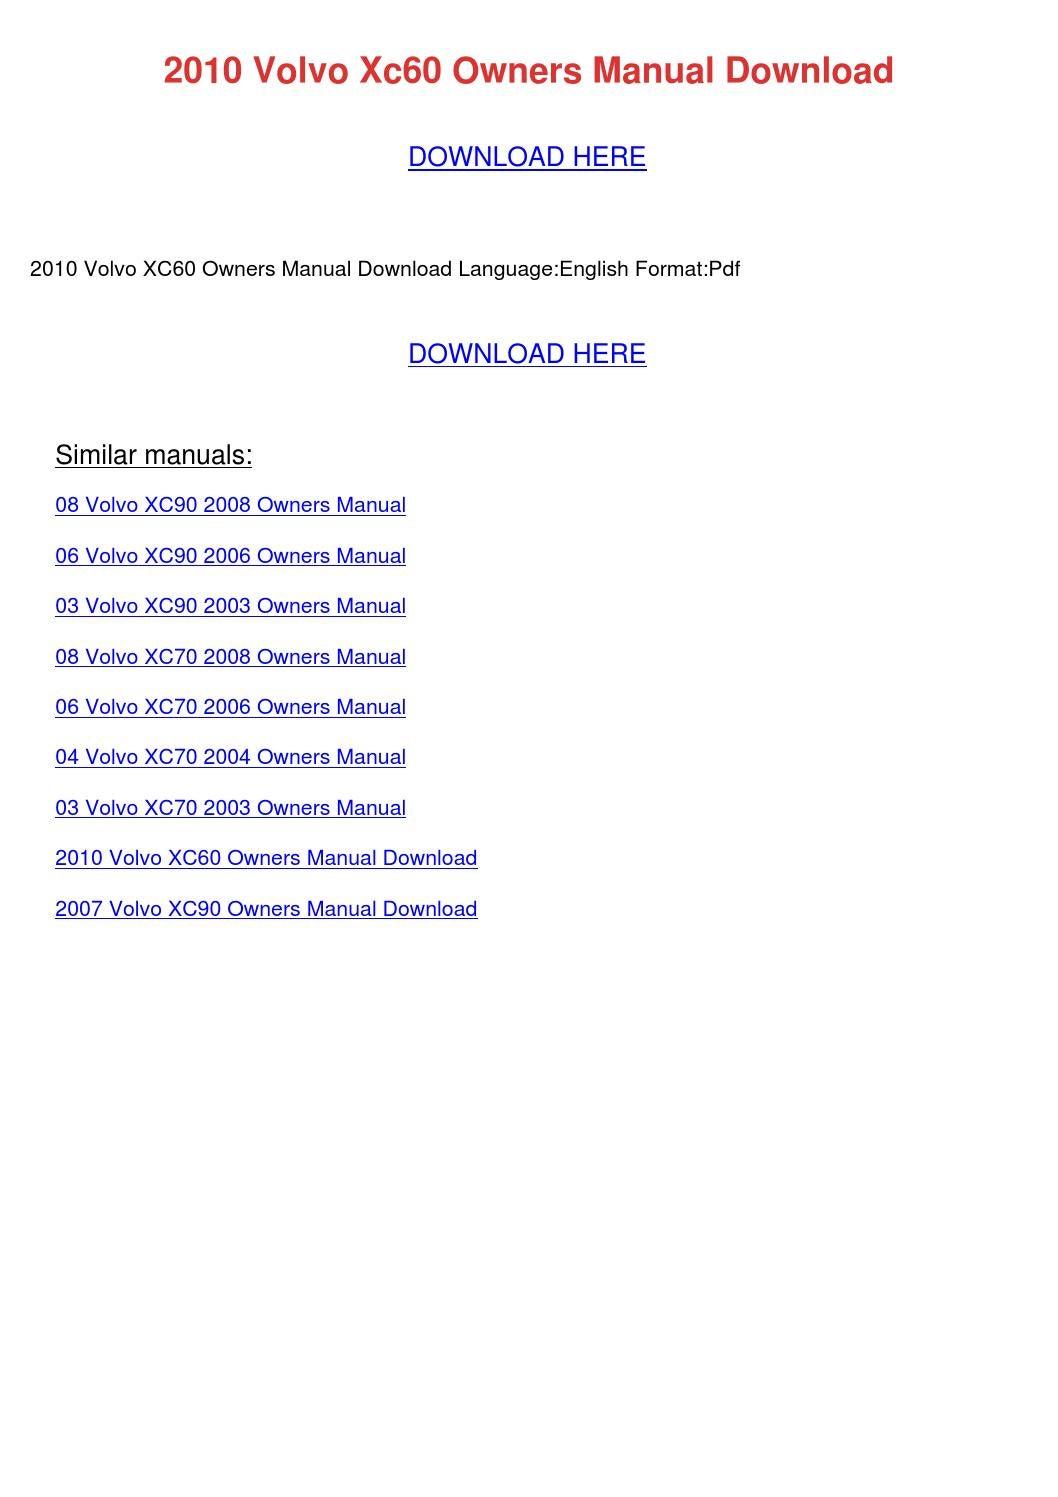 2007 volvo xc90 owners manual pdf